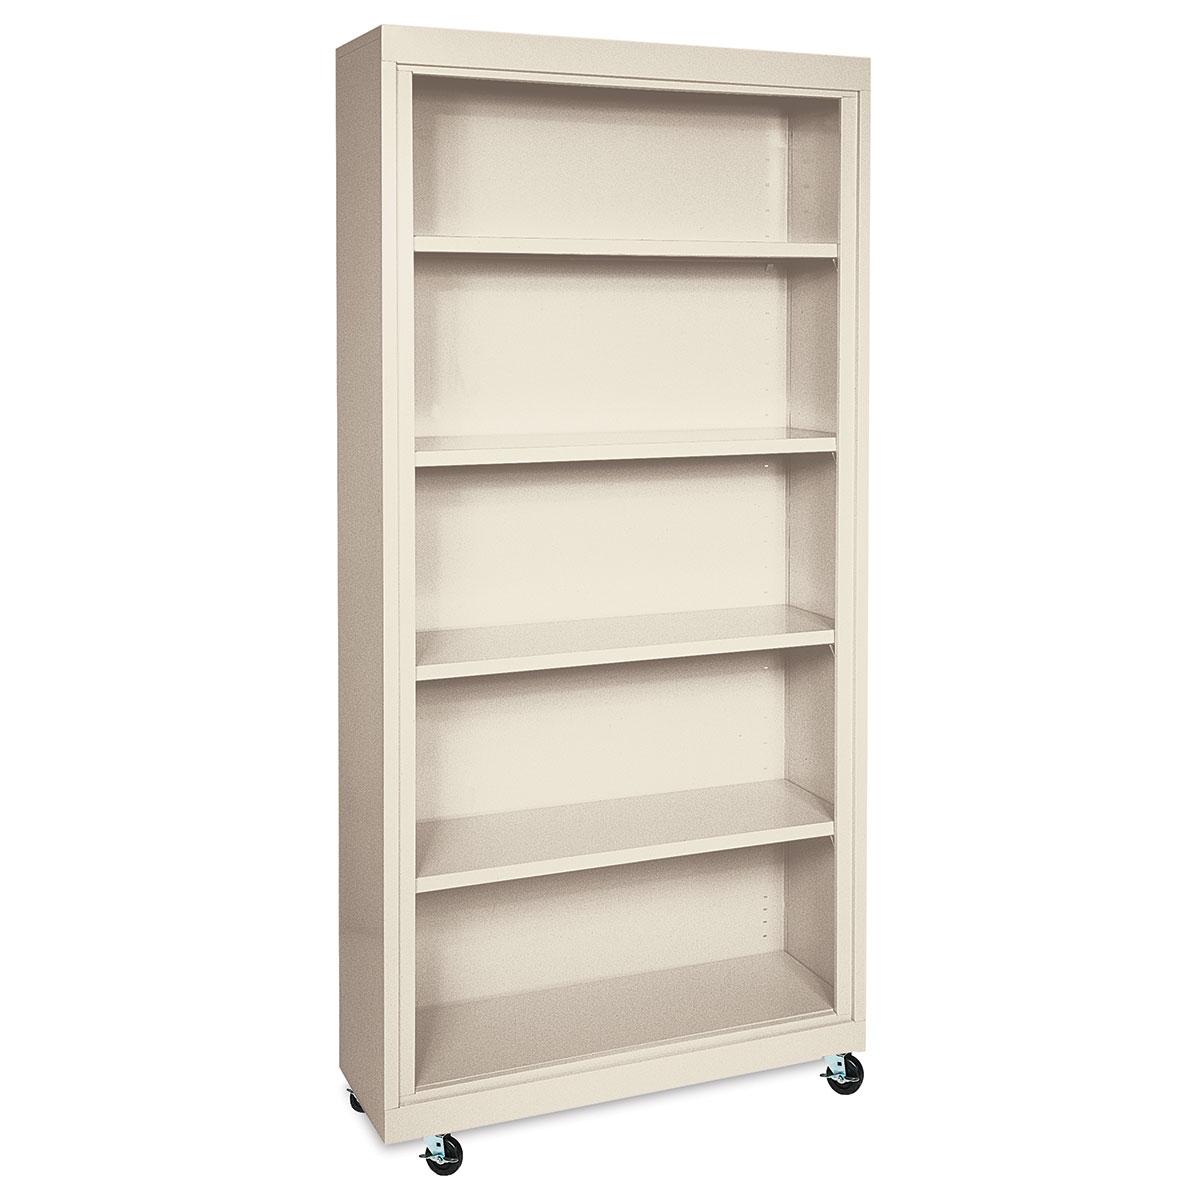 Sandusky Lee Mobile Bookcase - 36 x 78 x 18, Putty